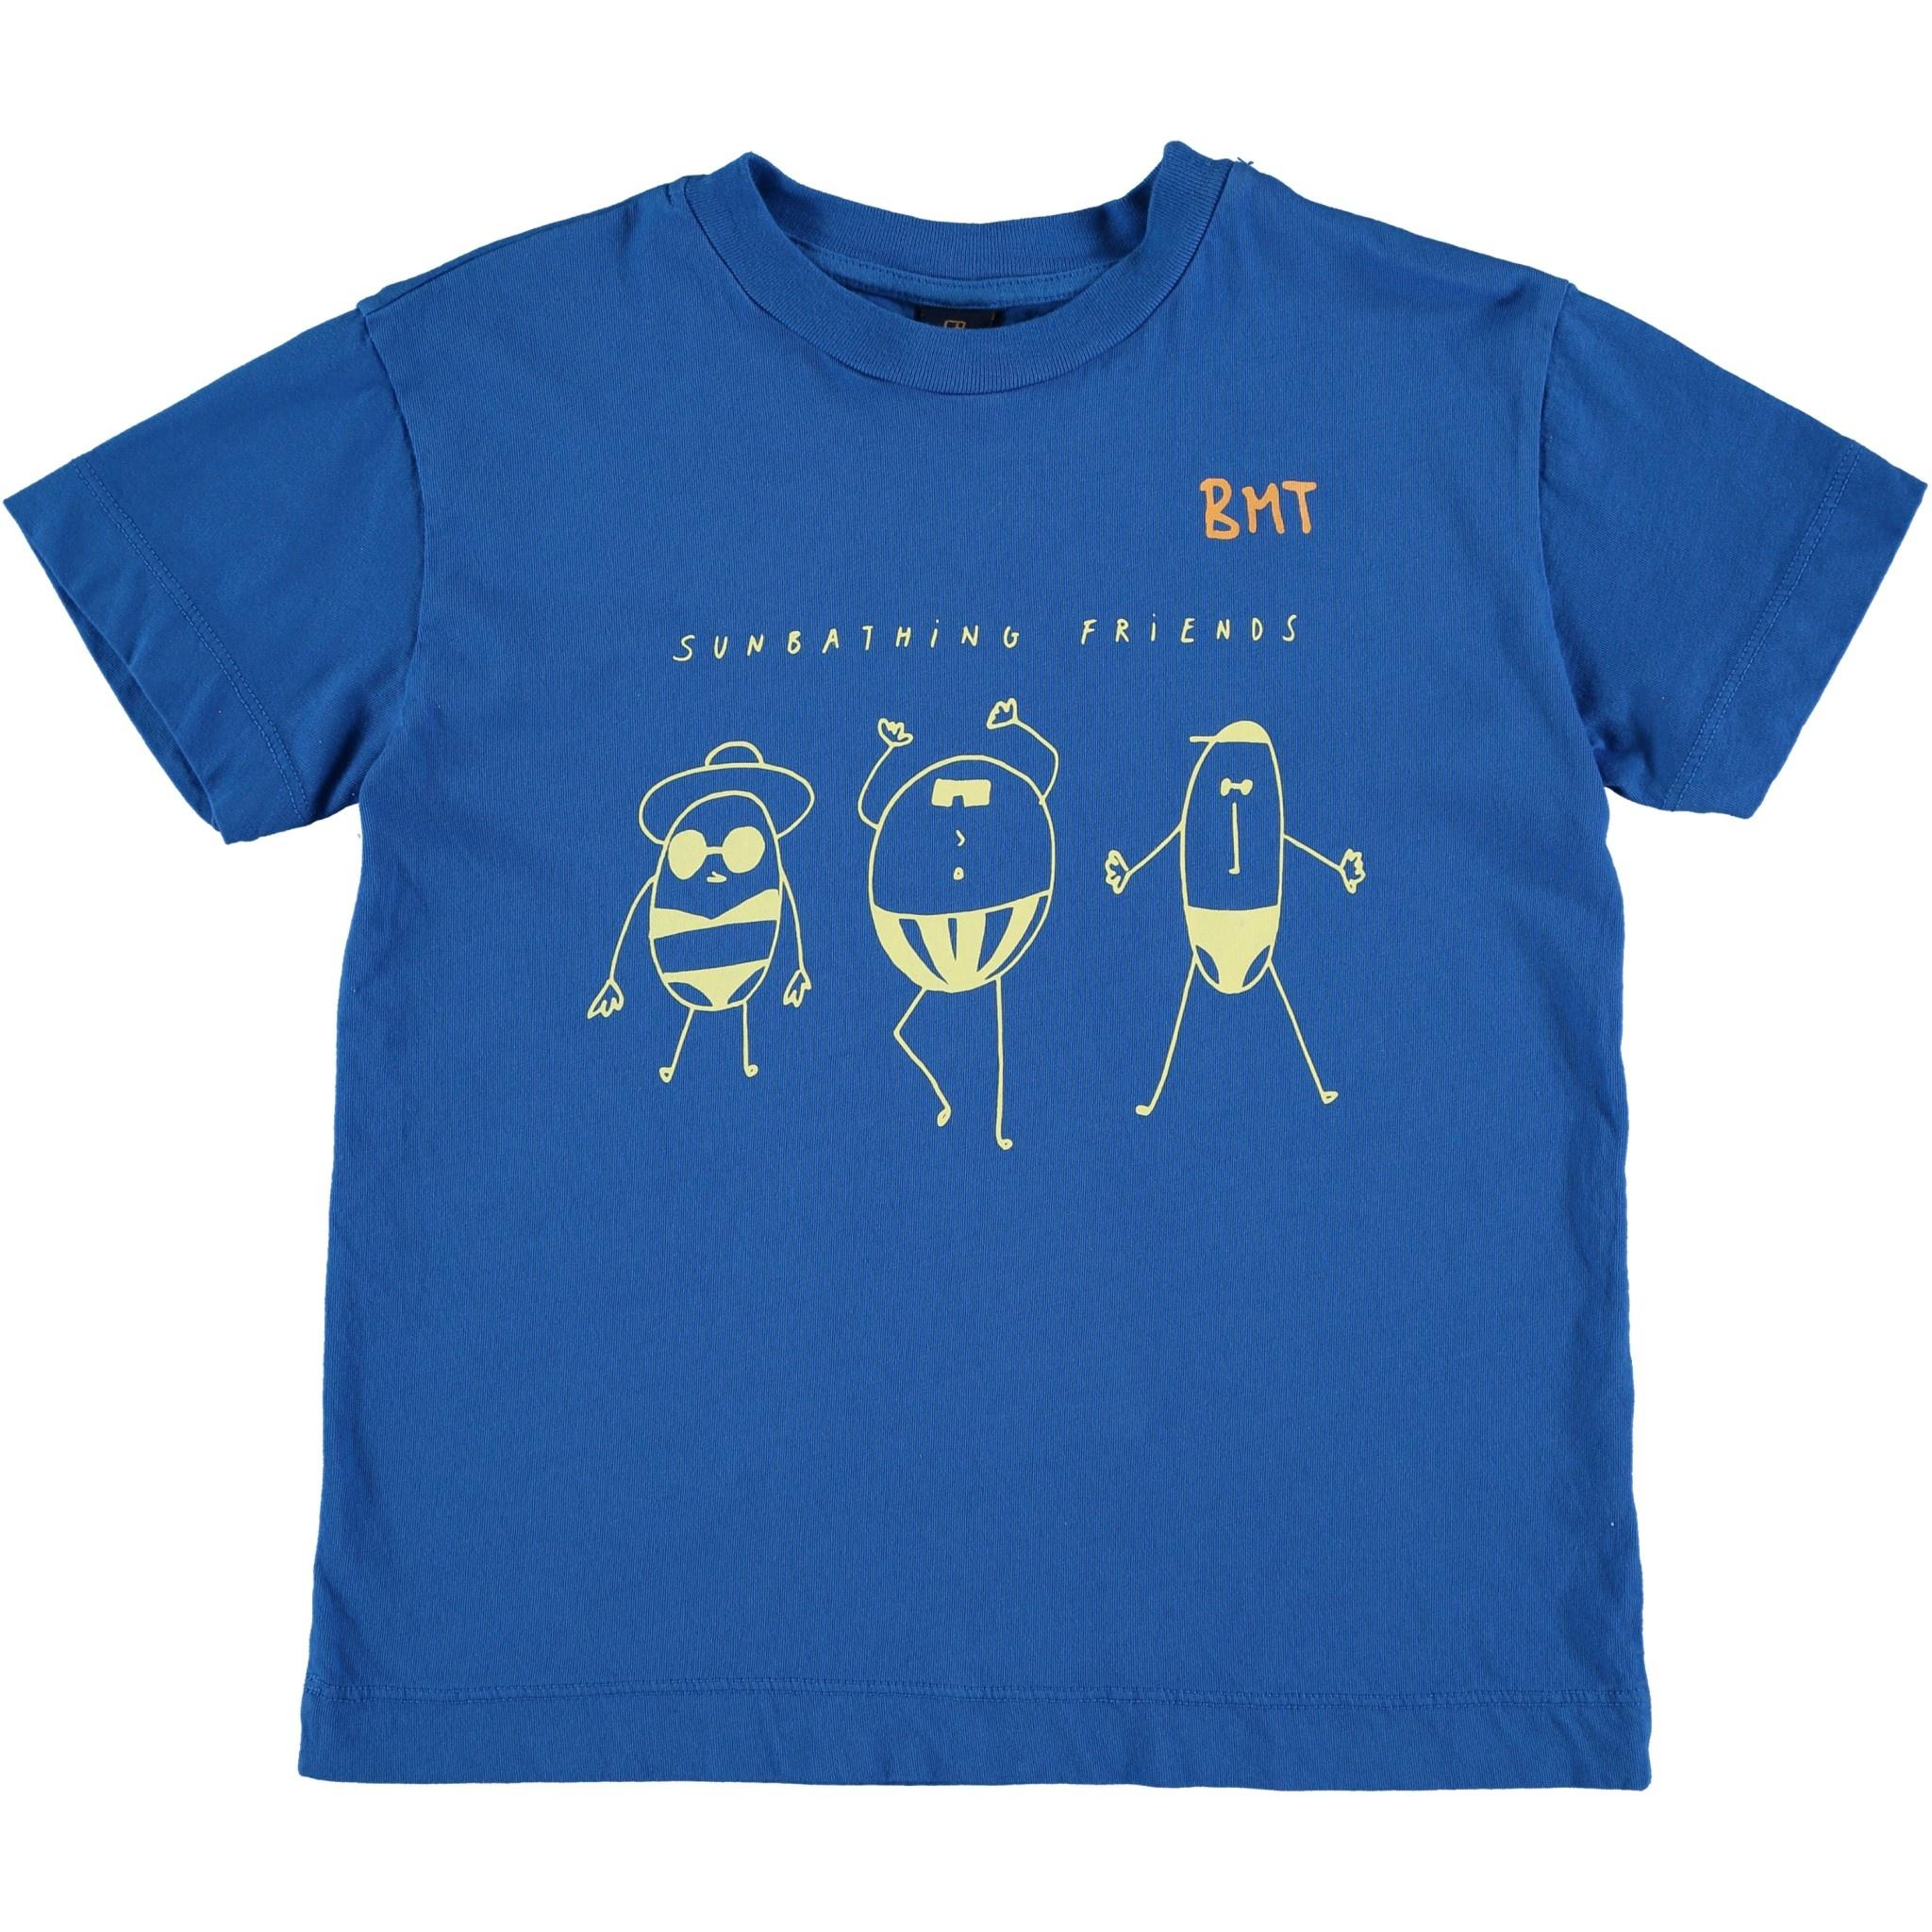 T-shirt sunbathing fresh blue kids-1